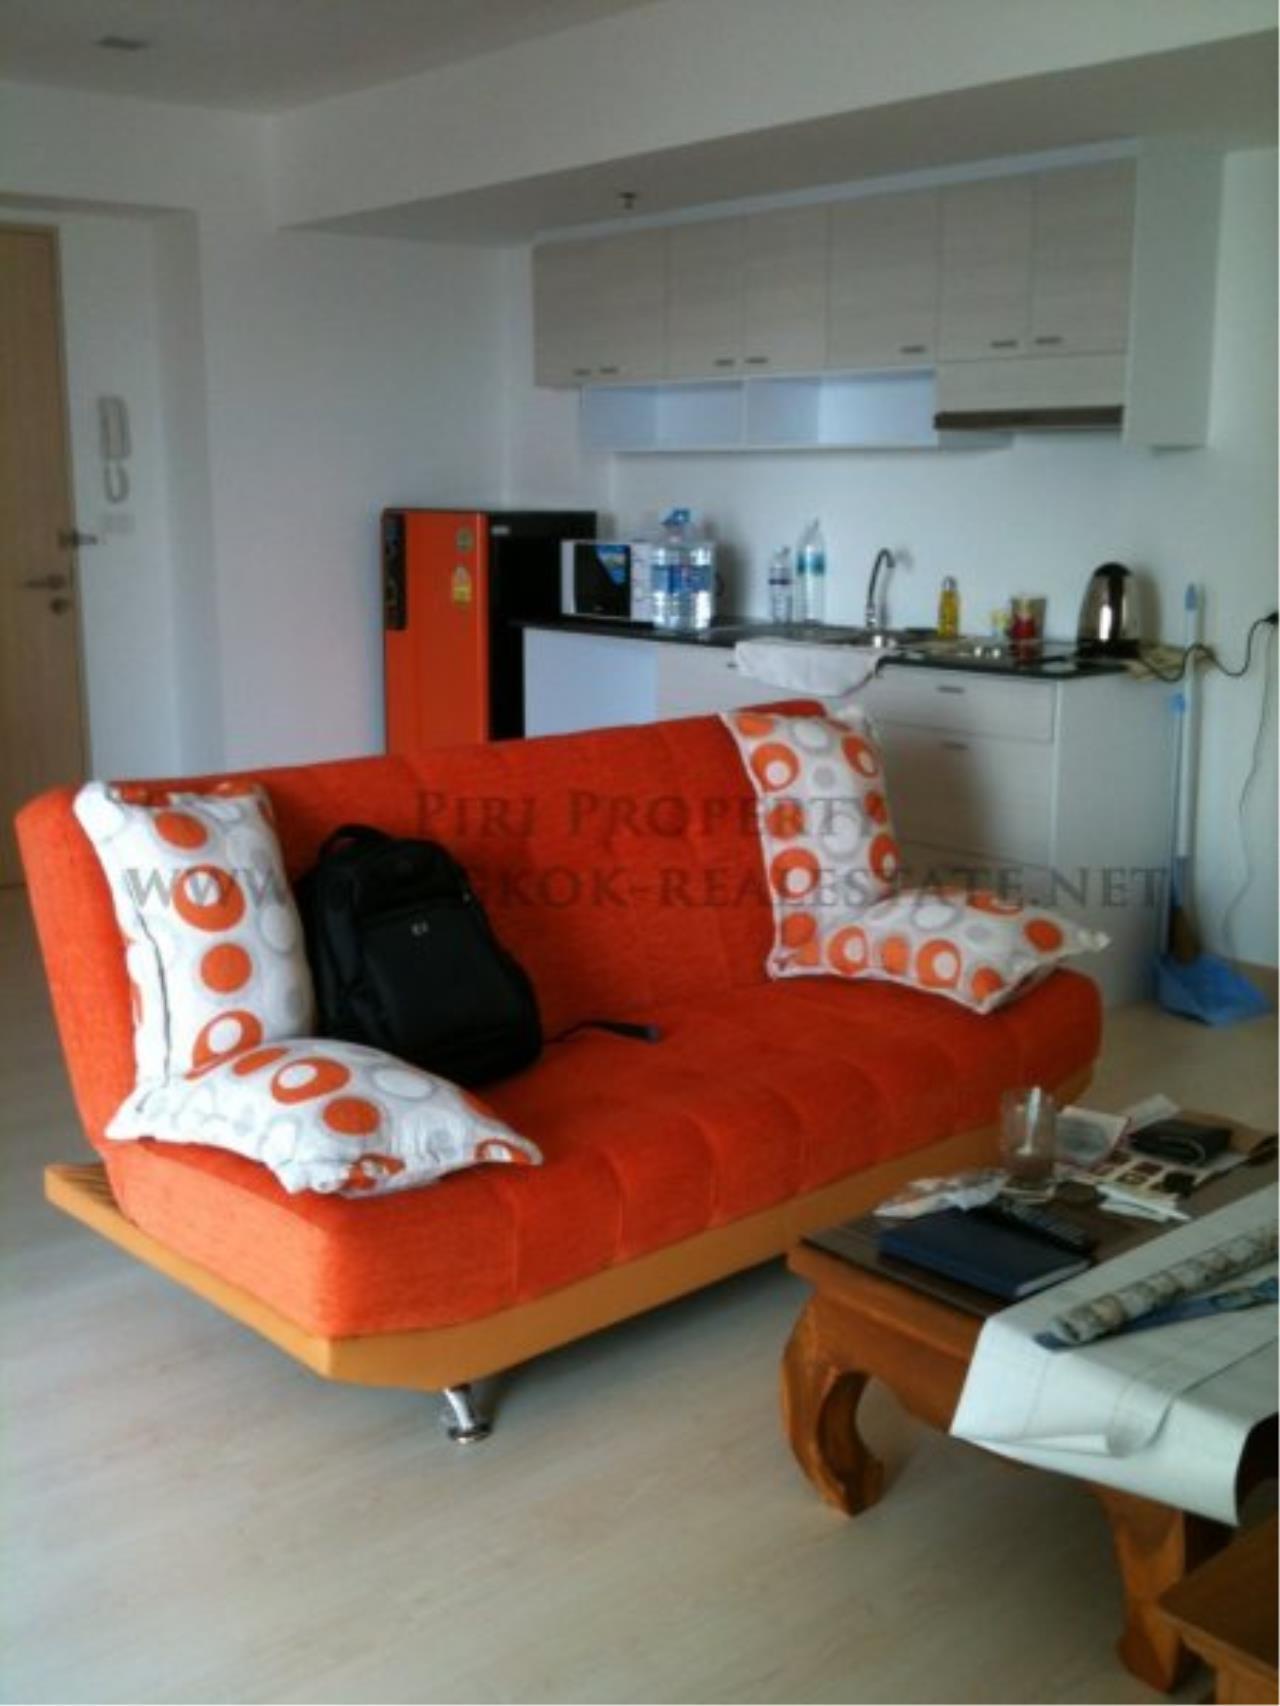 Piri Property Agency's My Resort Bangkok - Condo on 19th Floor for rent 3